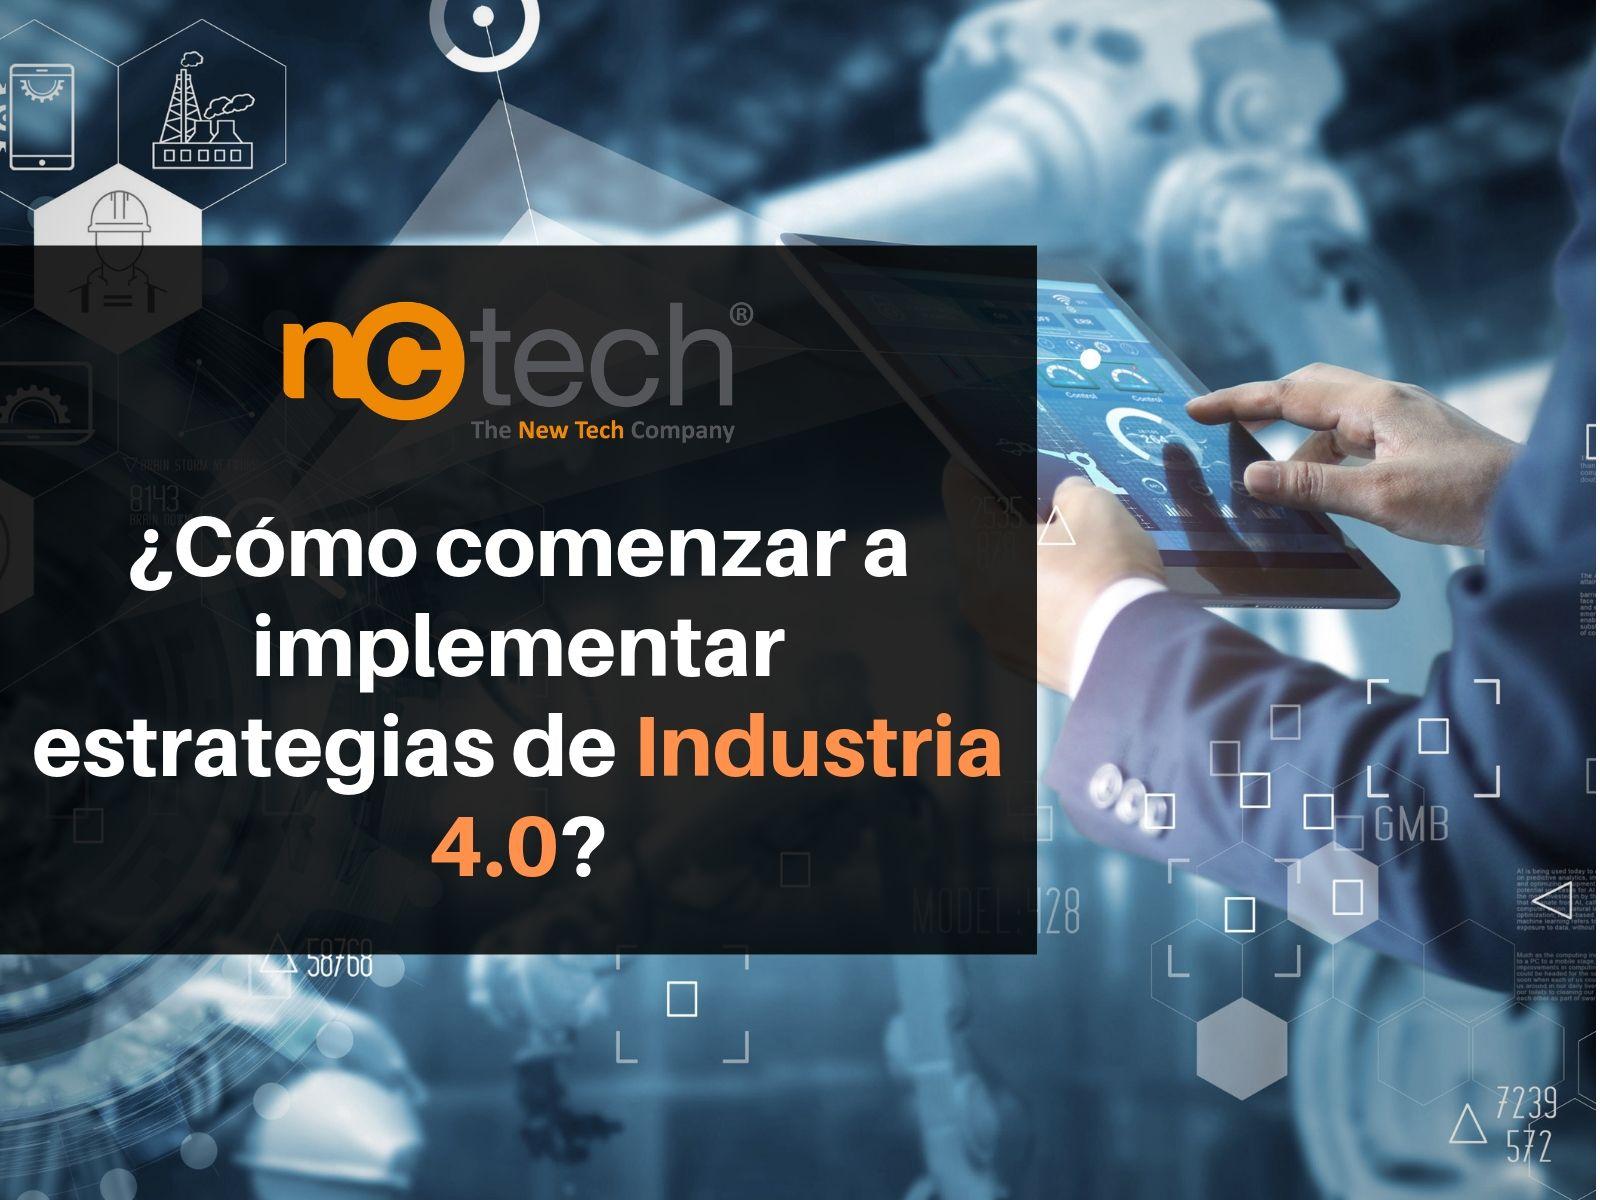 https://nctech.com.mx/wp-content/uploads/2019/07/¿Cómo-comenzar-a-implementar-estrategias-de-Industria-4.0_-3.jpg